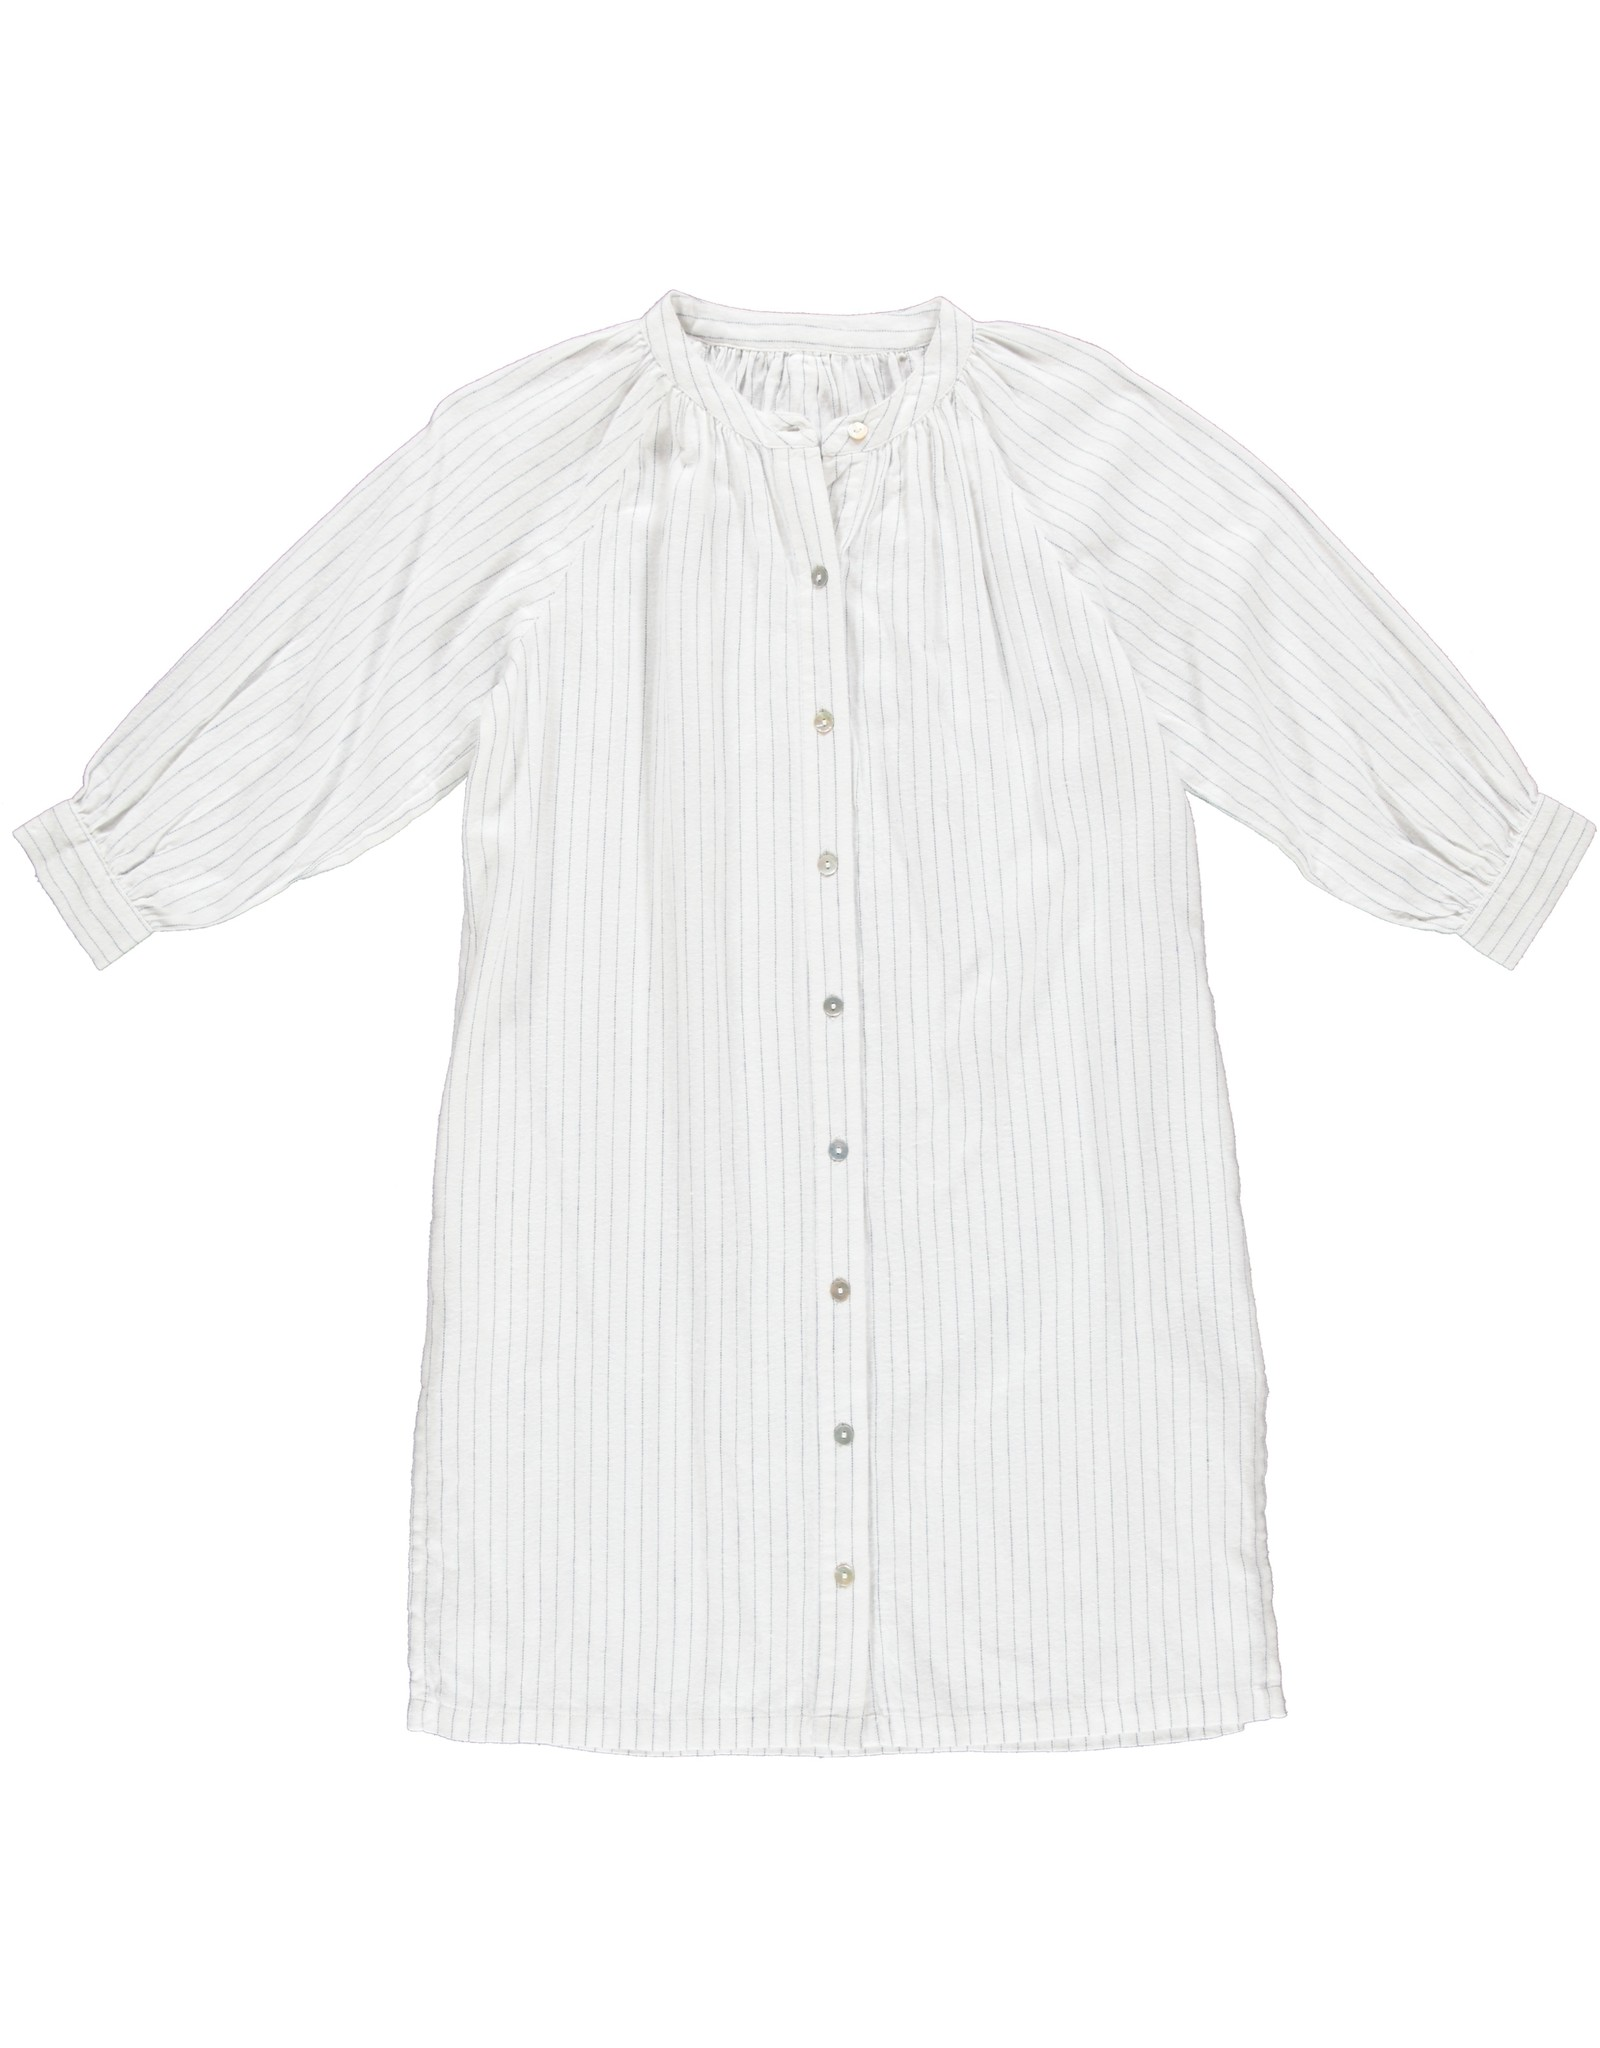 Dorélit Fai | Nightdress | Pin Stripe